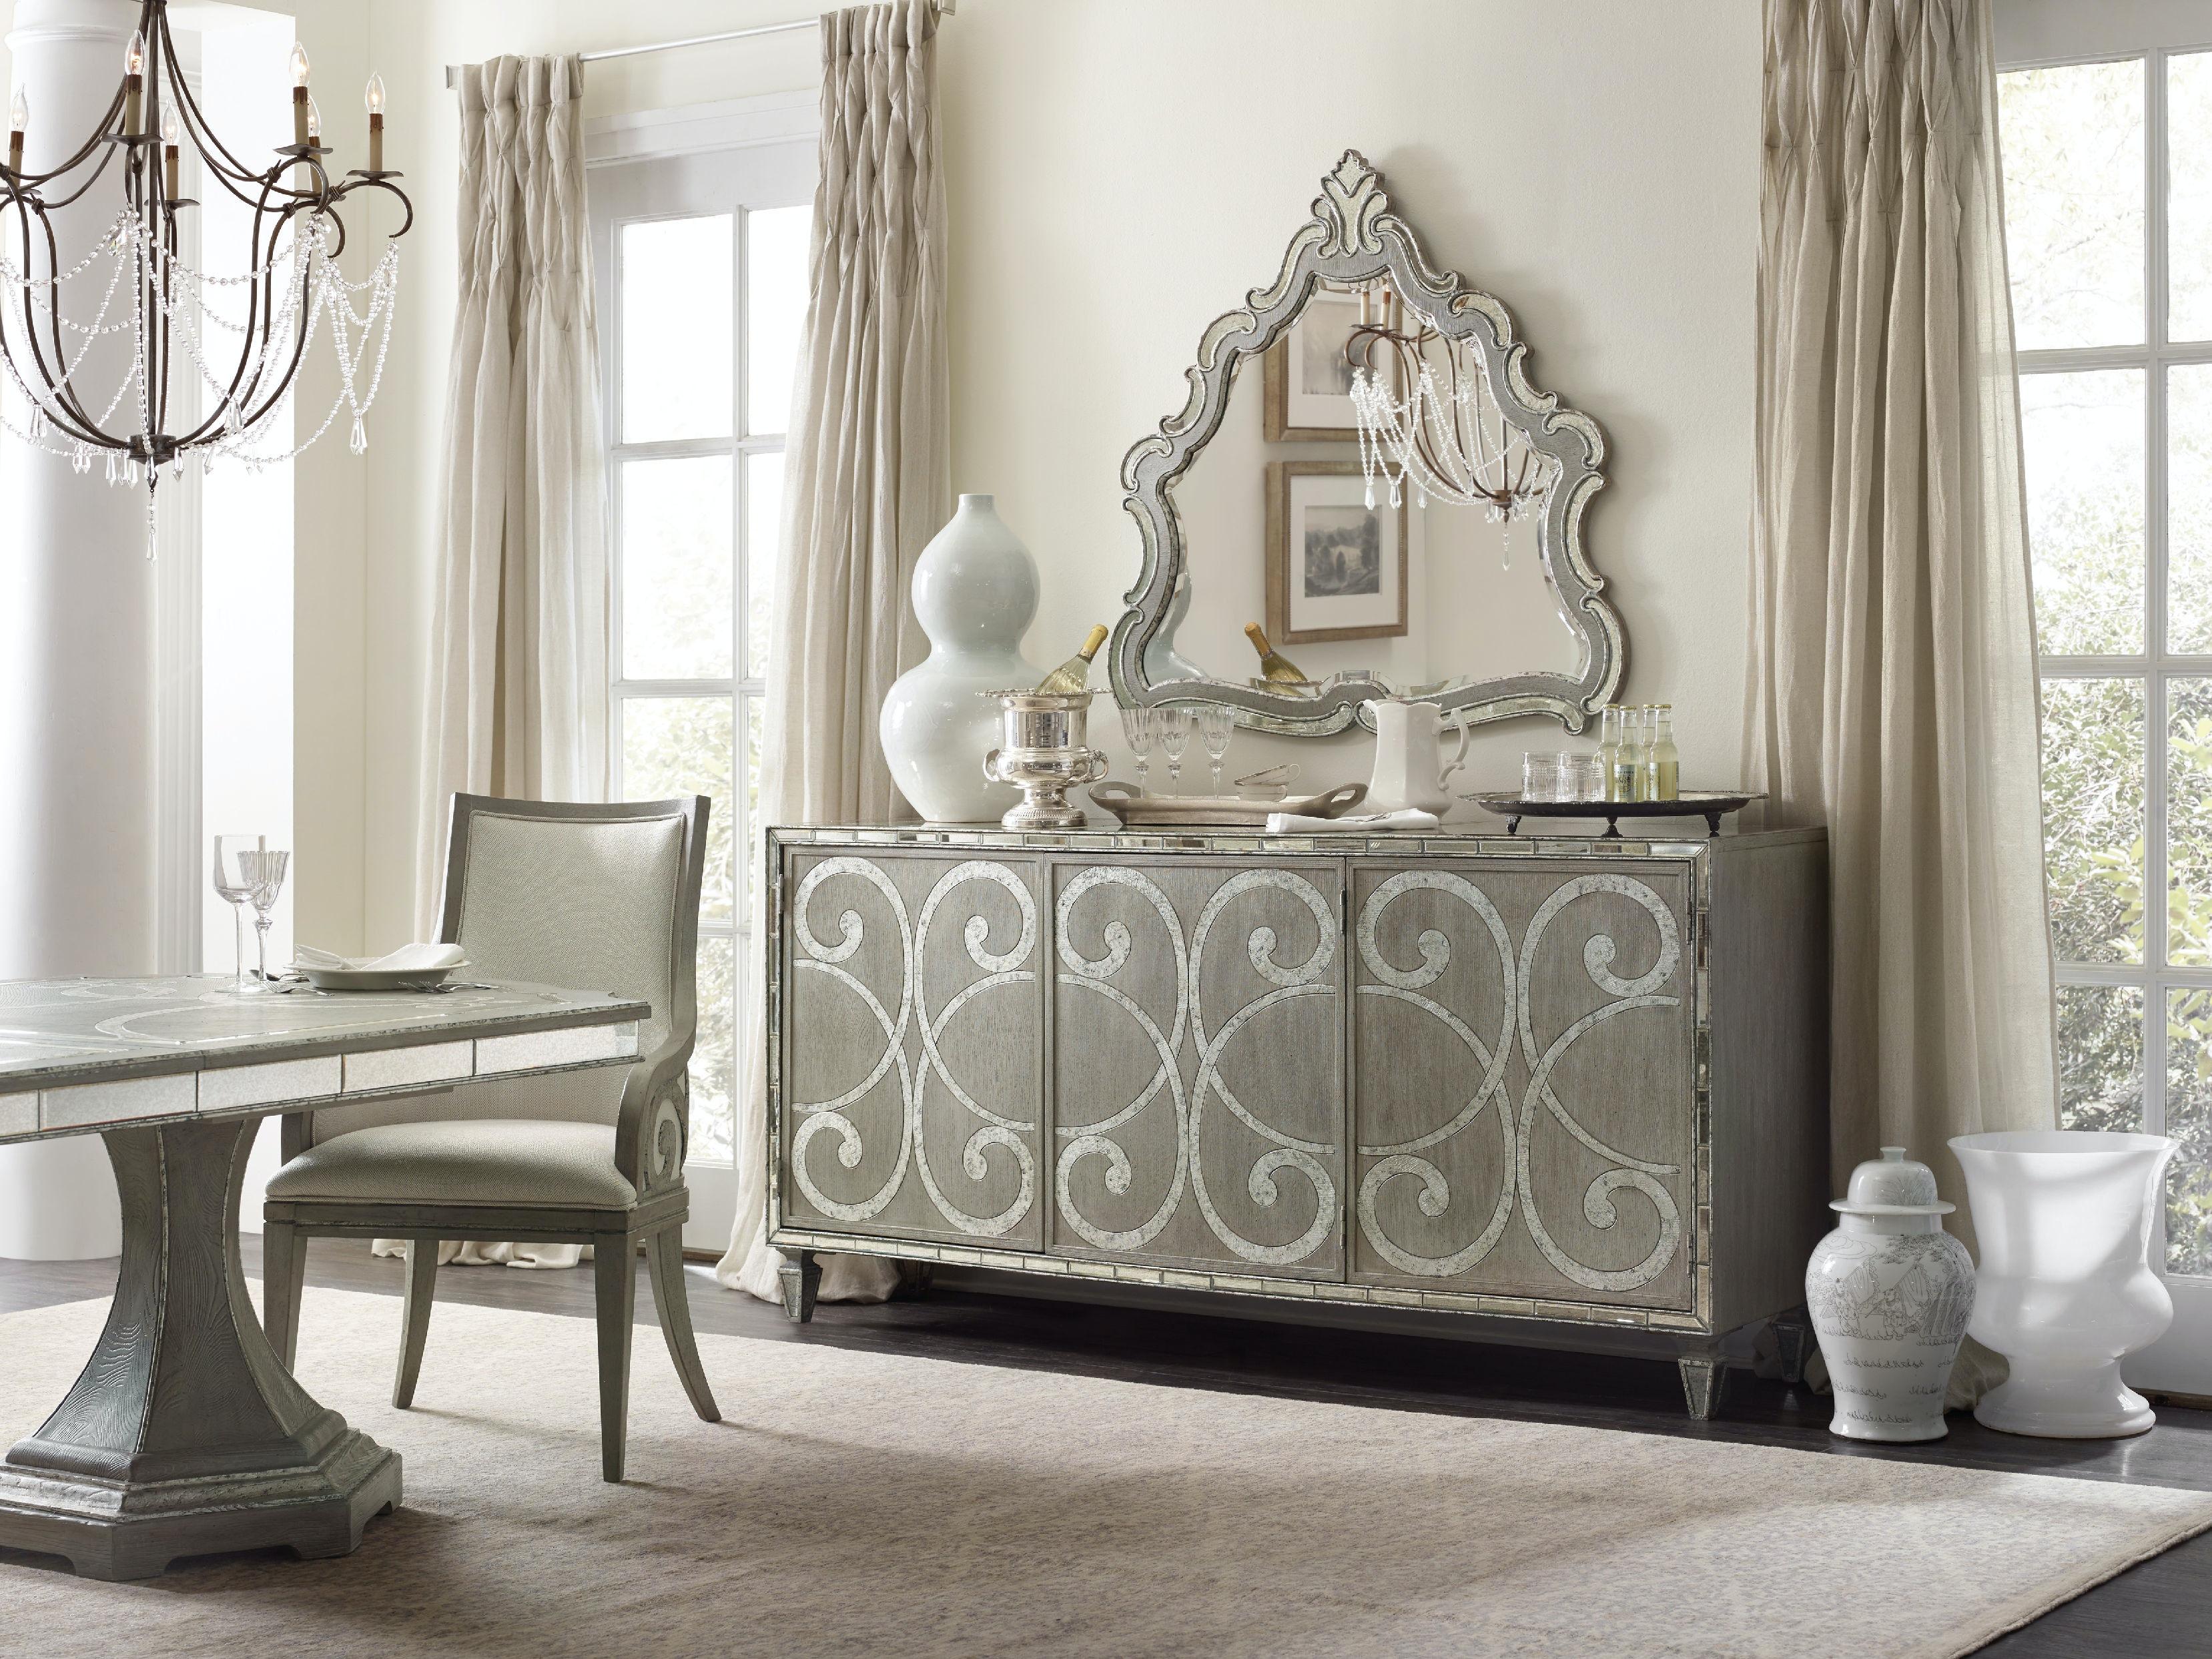 hooker furniture. Modren Hooker Hooker Furniture Sanctuary Buffet 560375900LTBR Intended